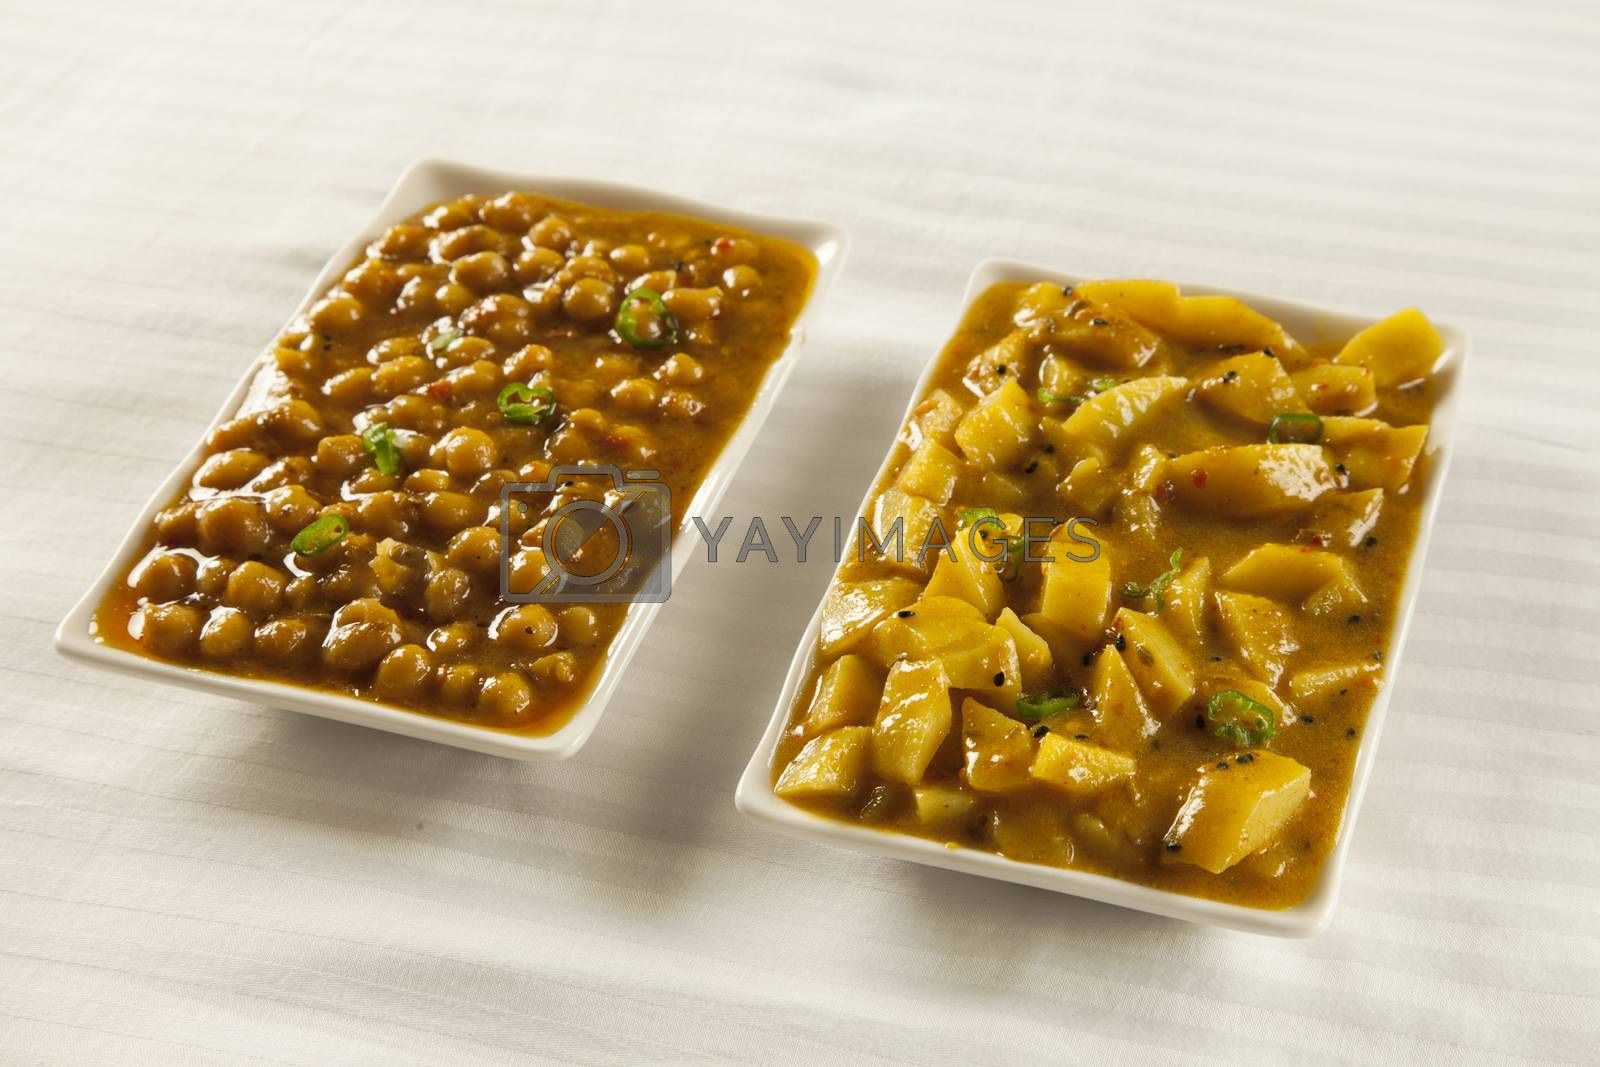 Royalty free image of Indian/Pakistani cuisine Aaloo bhujia and Channa  by haiderazim